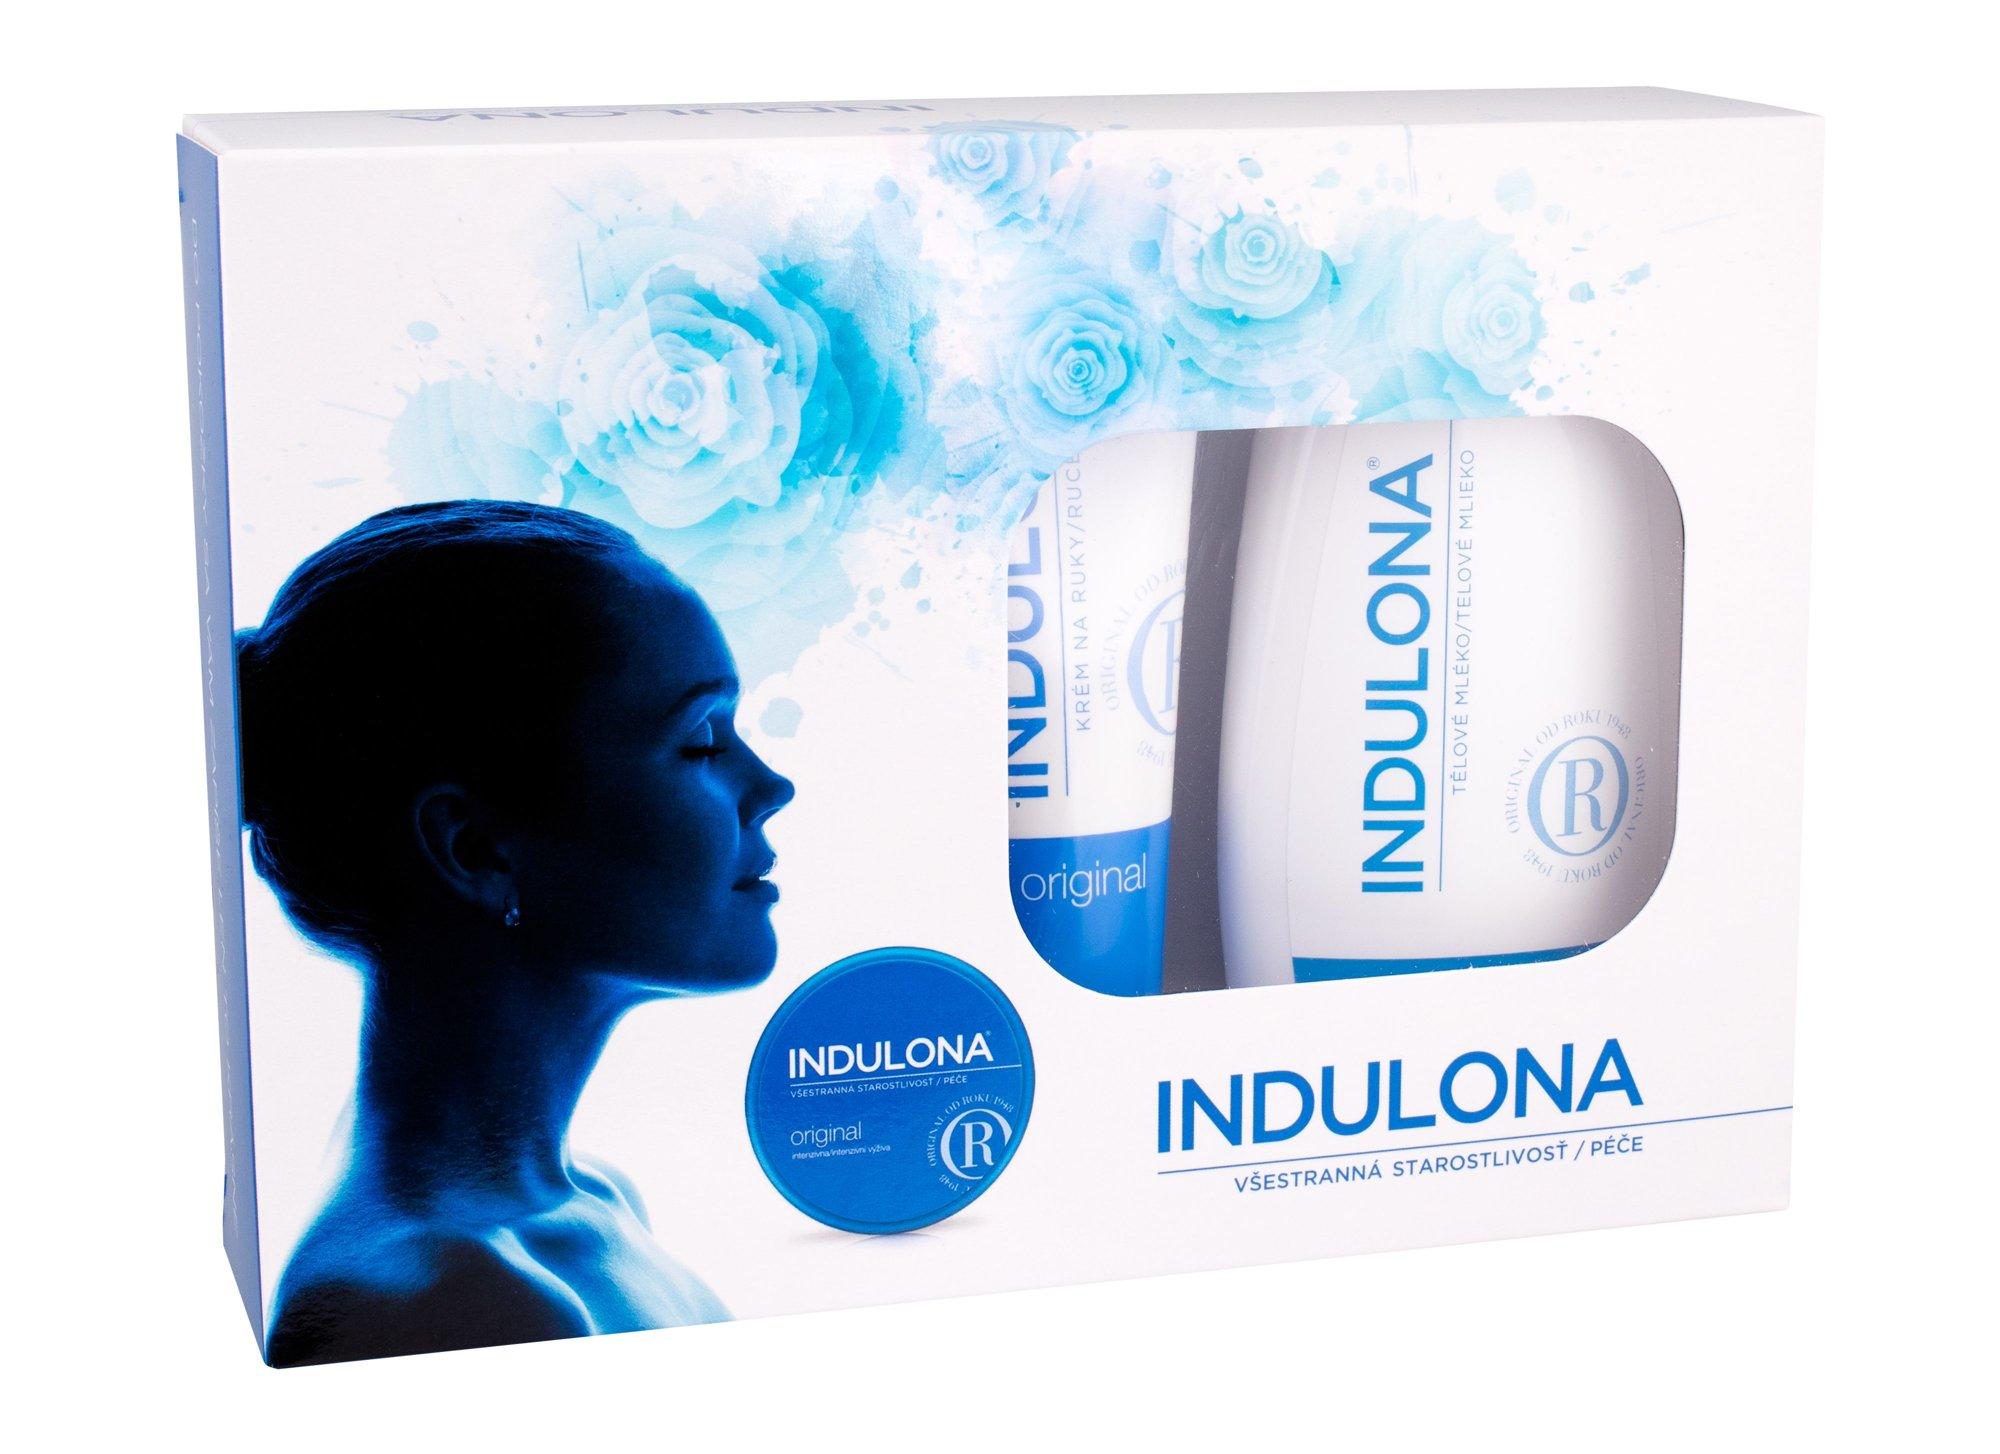 INDULONA Original Cosmetic 250ml